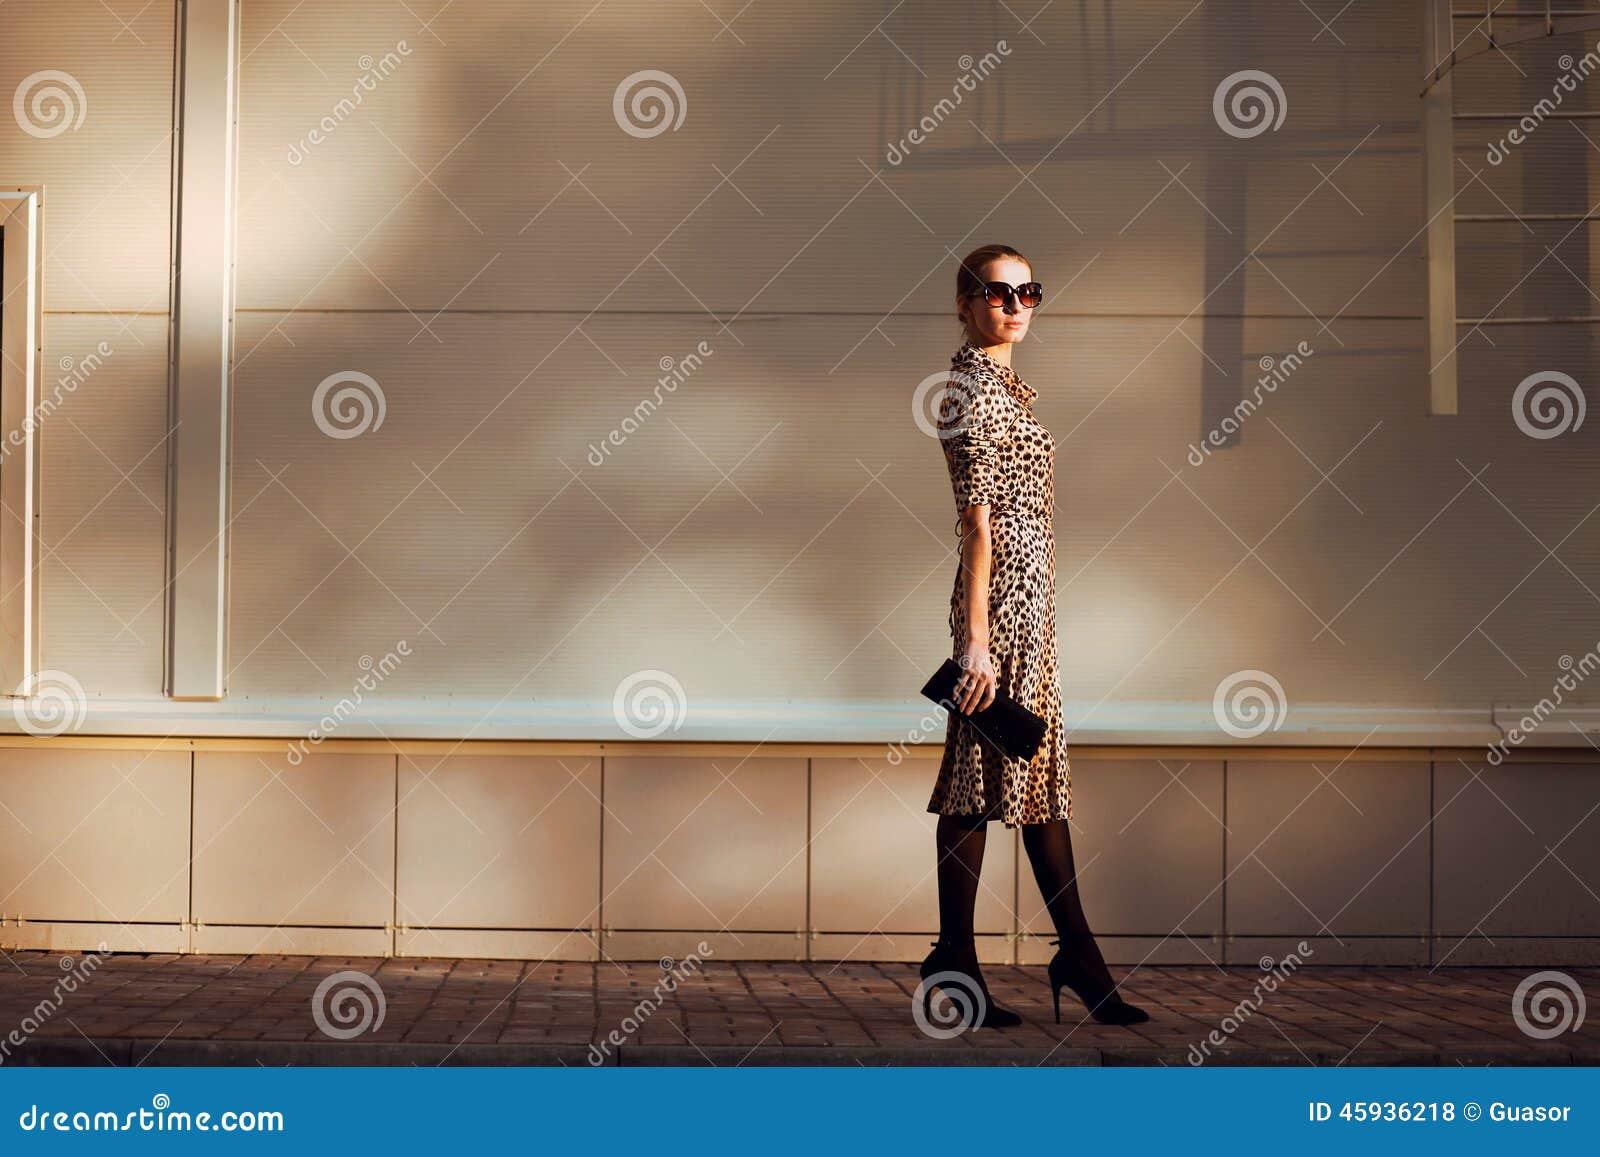 Street fashion, pretty elegant woman model in leopard dress